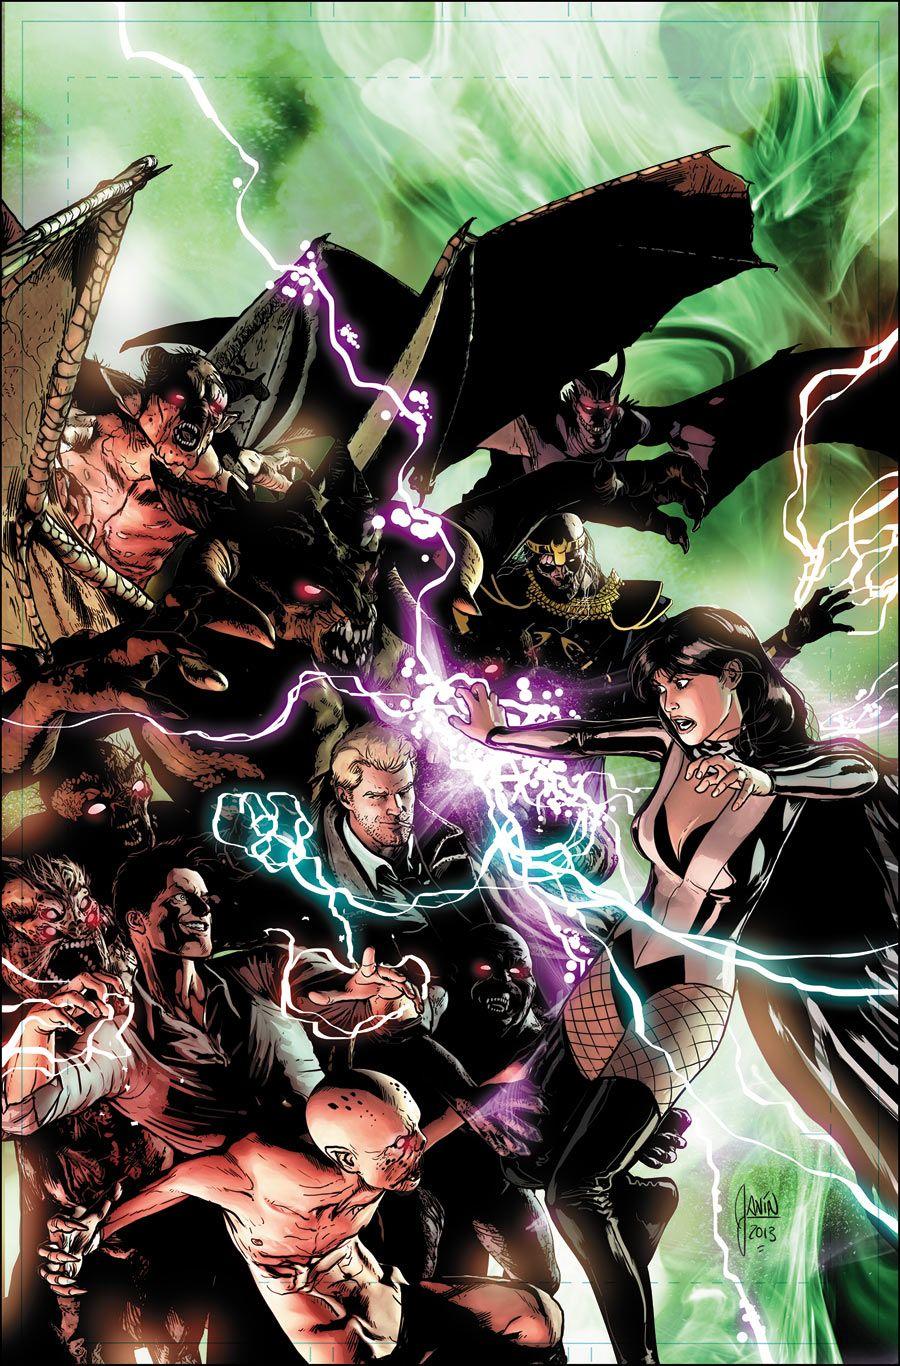 Justice League Dark Mikel Janin Darkhorse Comics Arte Em